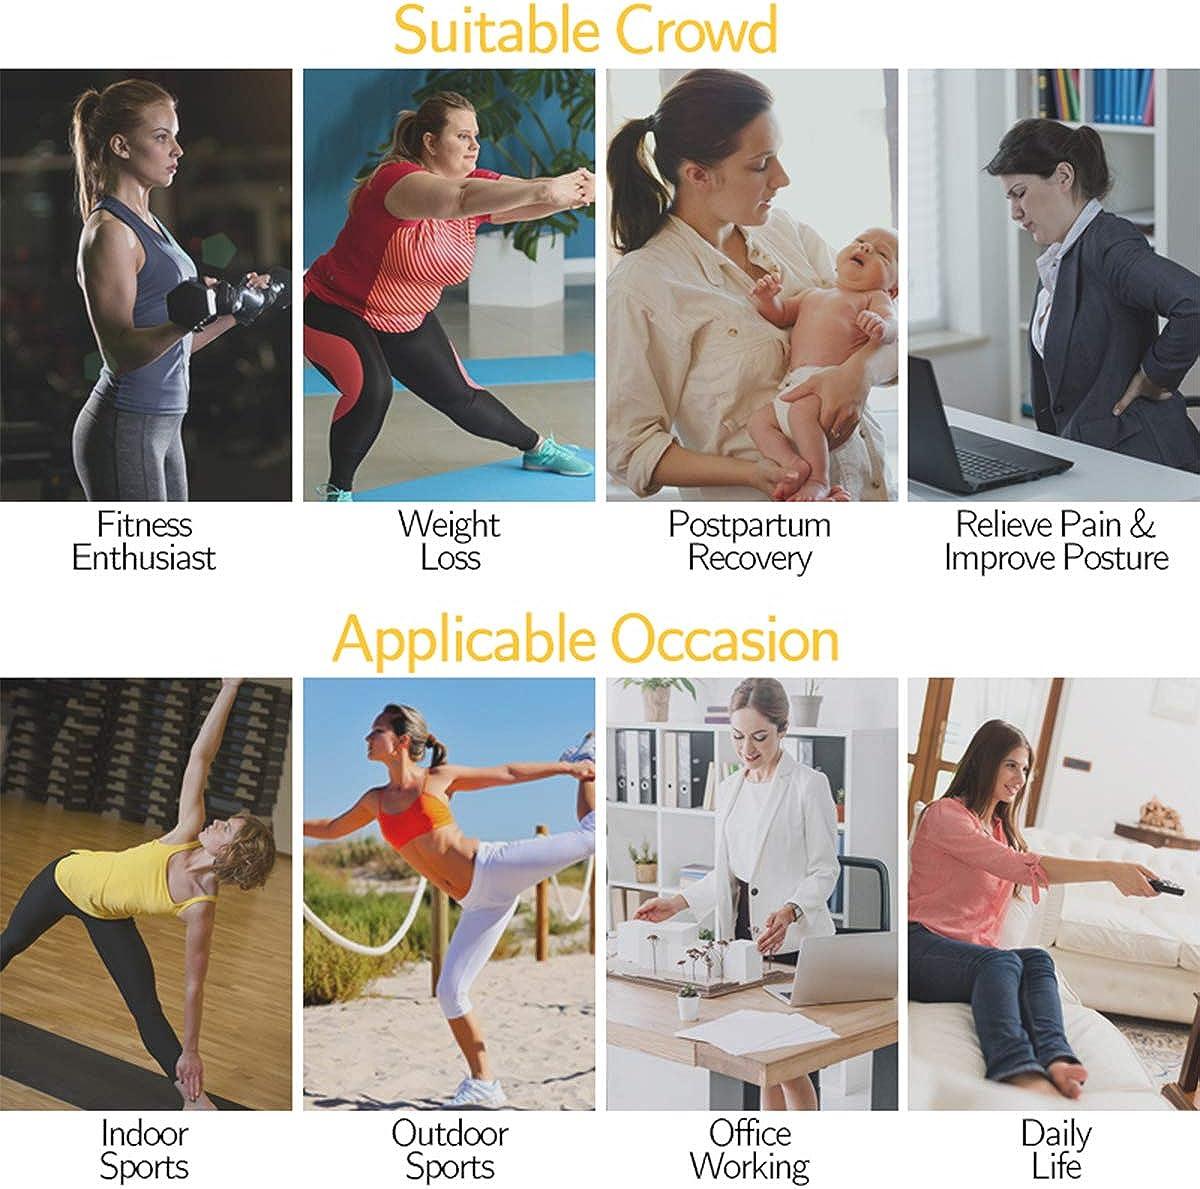 Waist Trimmer for Women, Sauna Sweat Waist Trainer Corset Belt, Body Shaper Slimming Workout Girdle Shapewear: Clothing